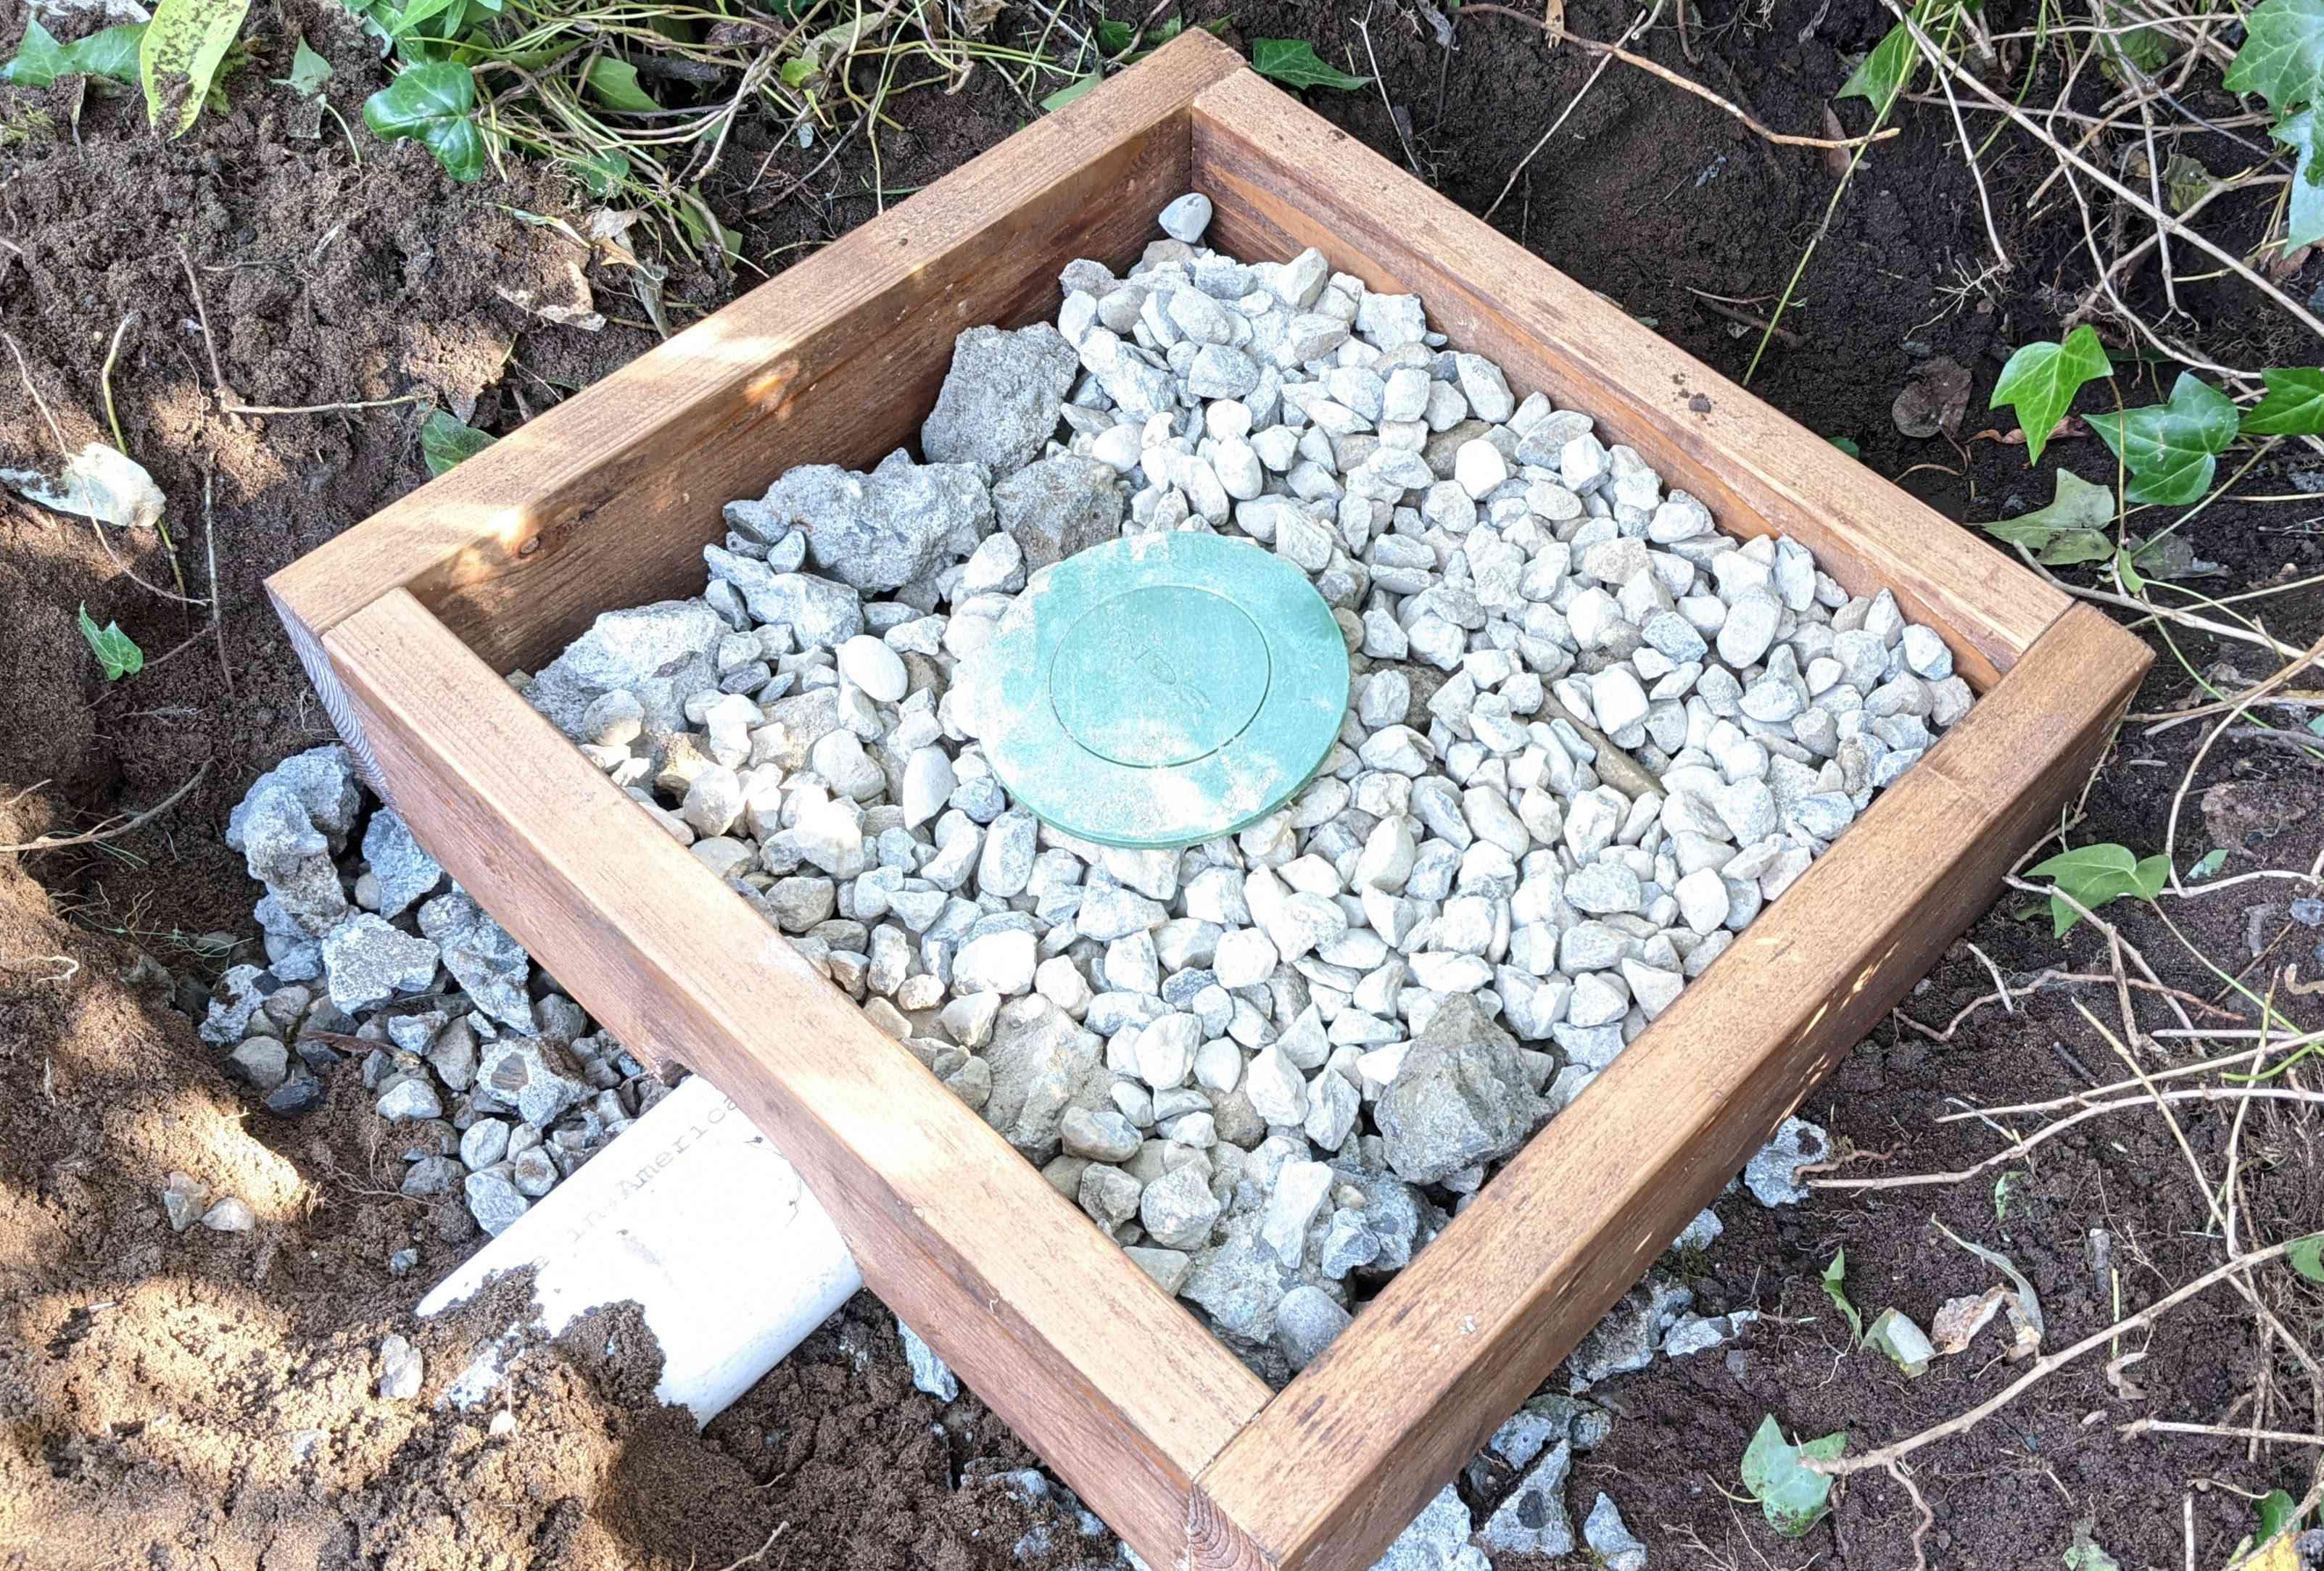 Add Gravel Around the Emitter